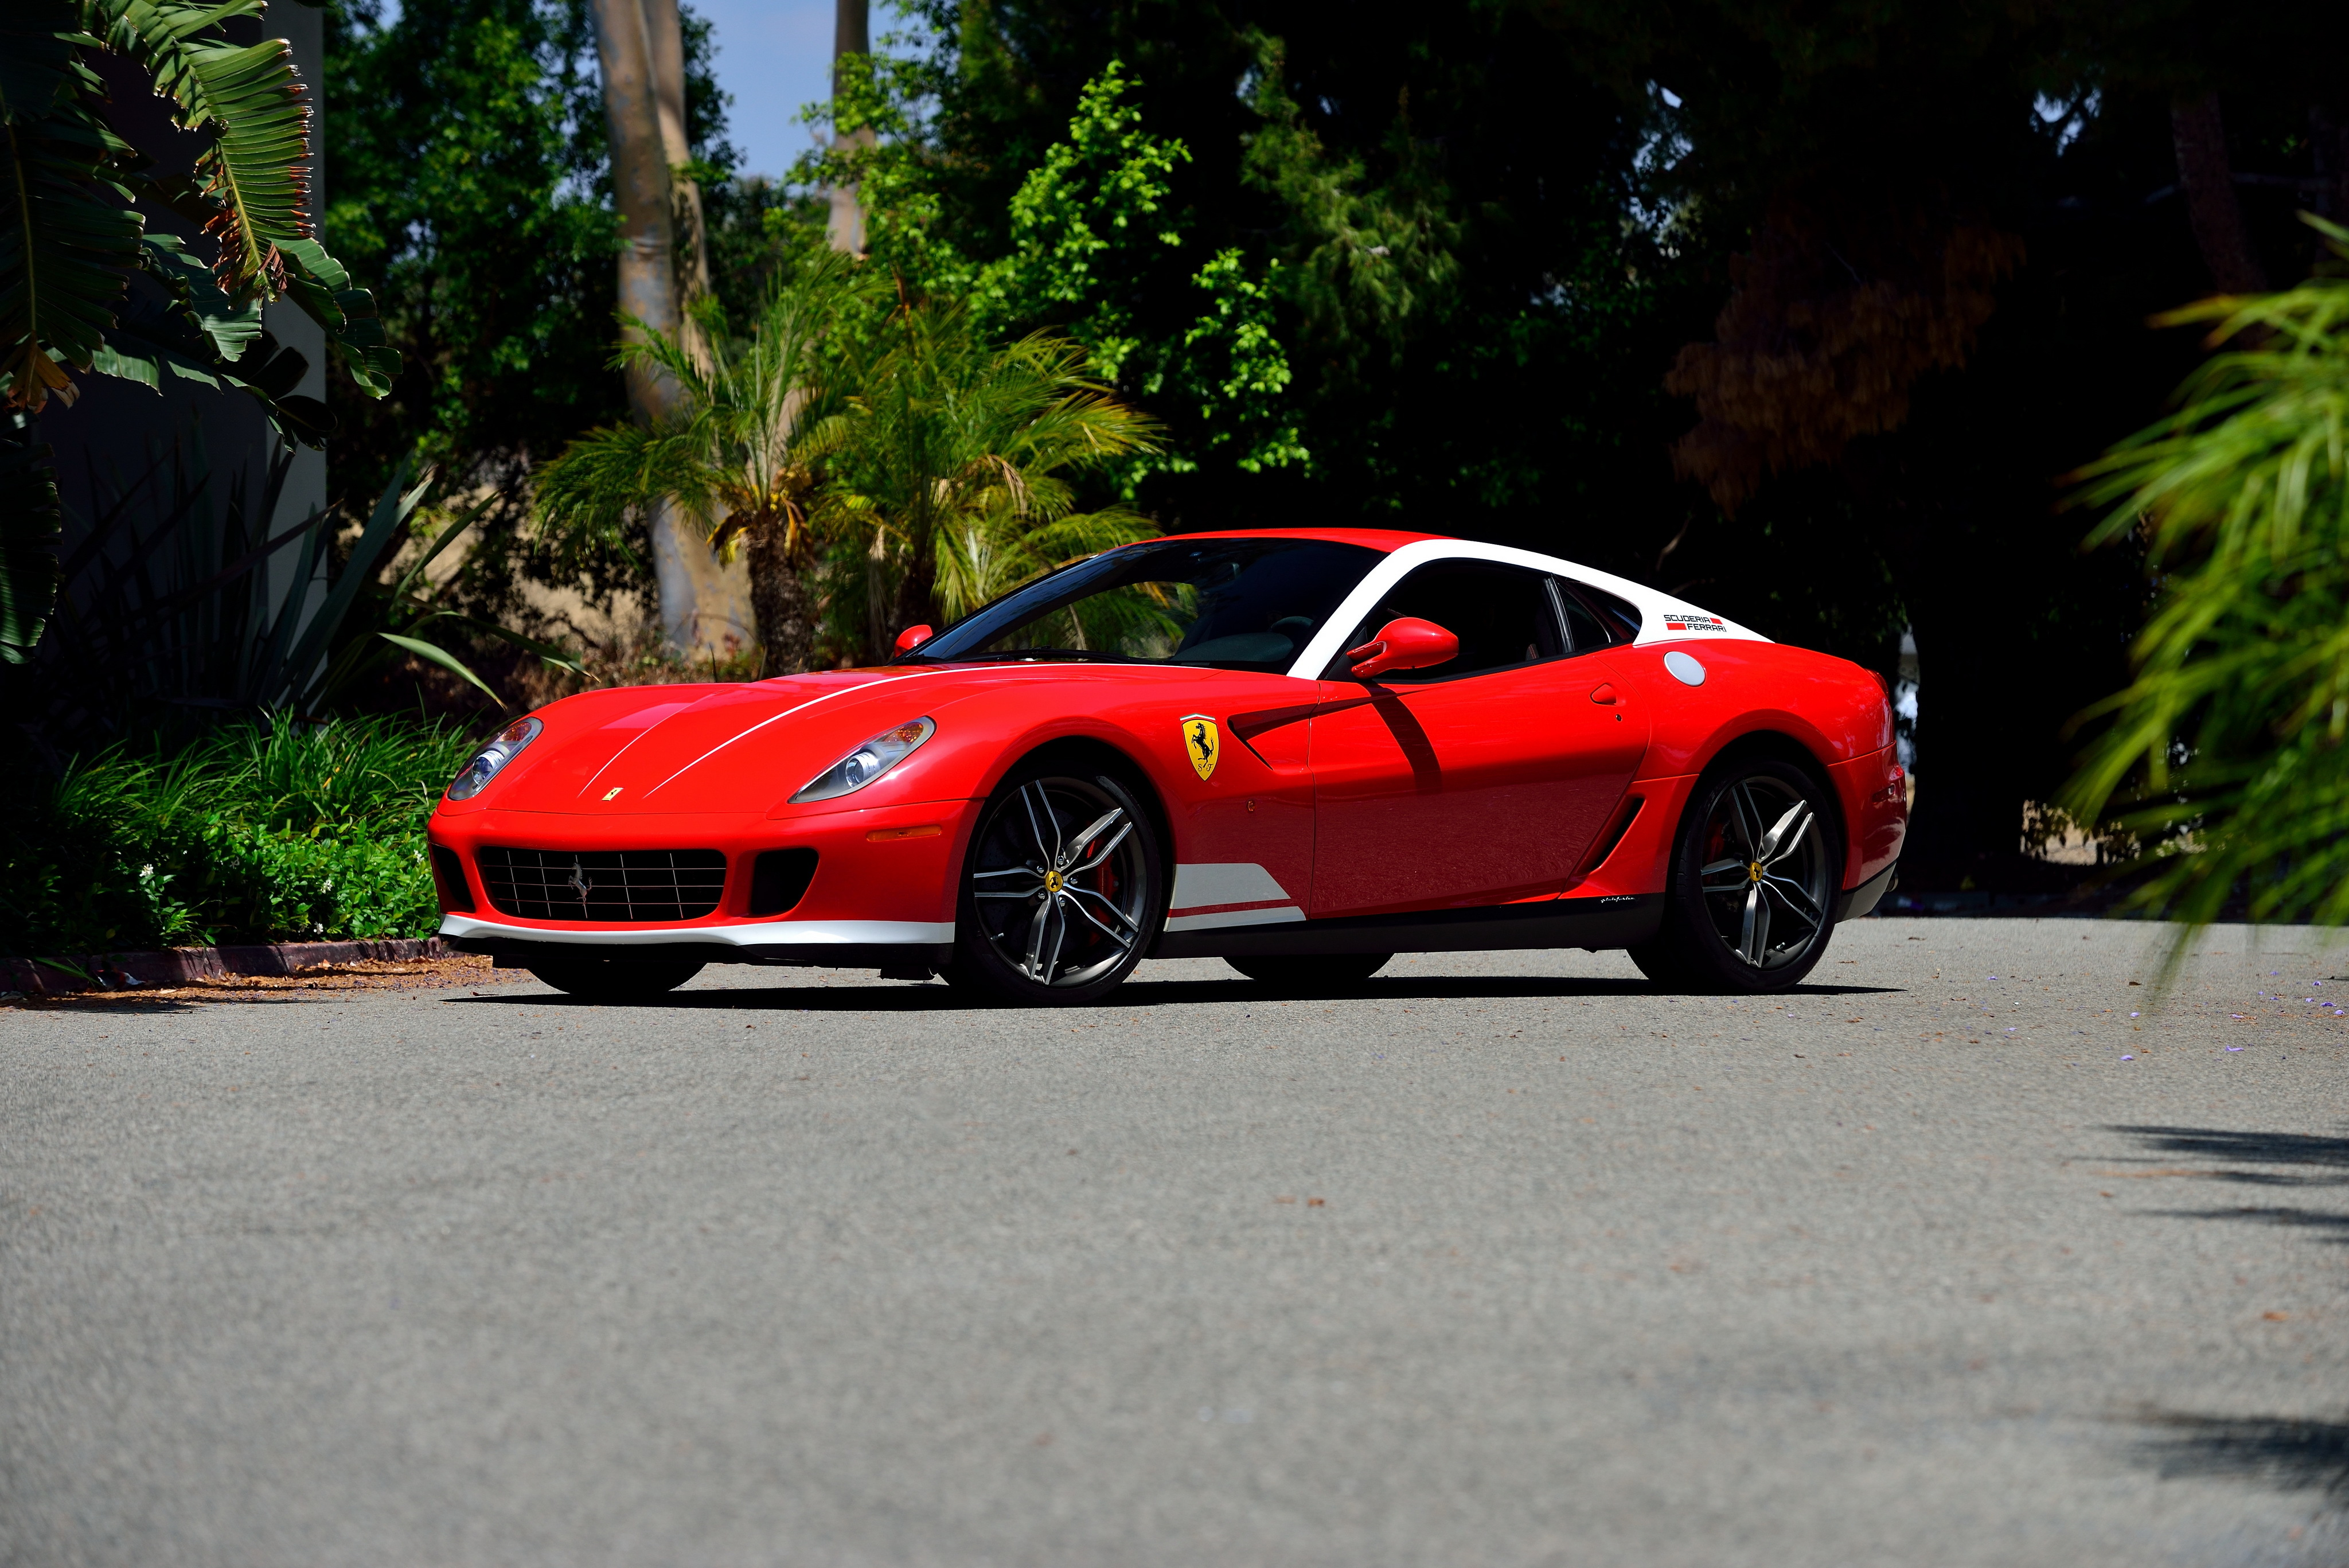 139237 download wallpaper Cars, Pininfarina, Ferrari, 599, Gtb screensavers and pictures for free